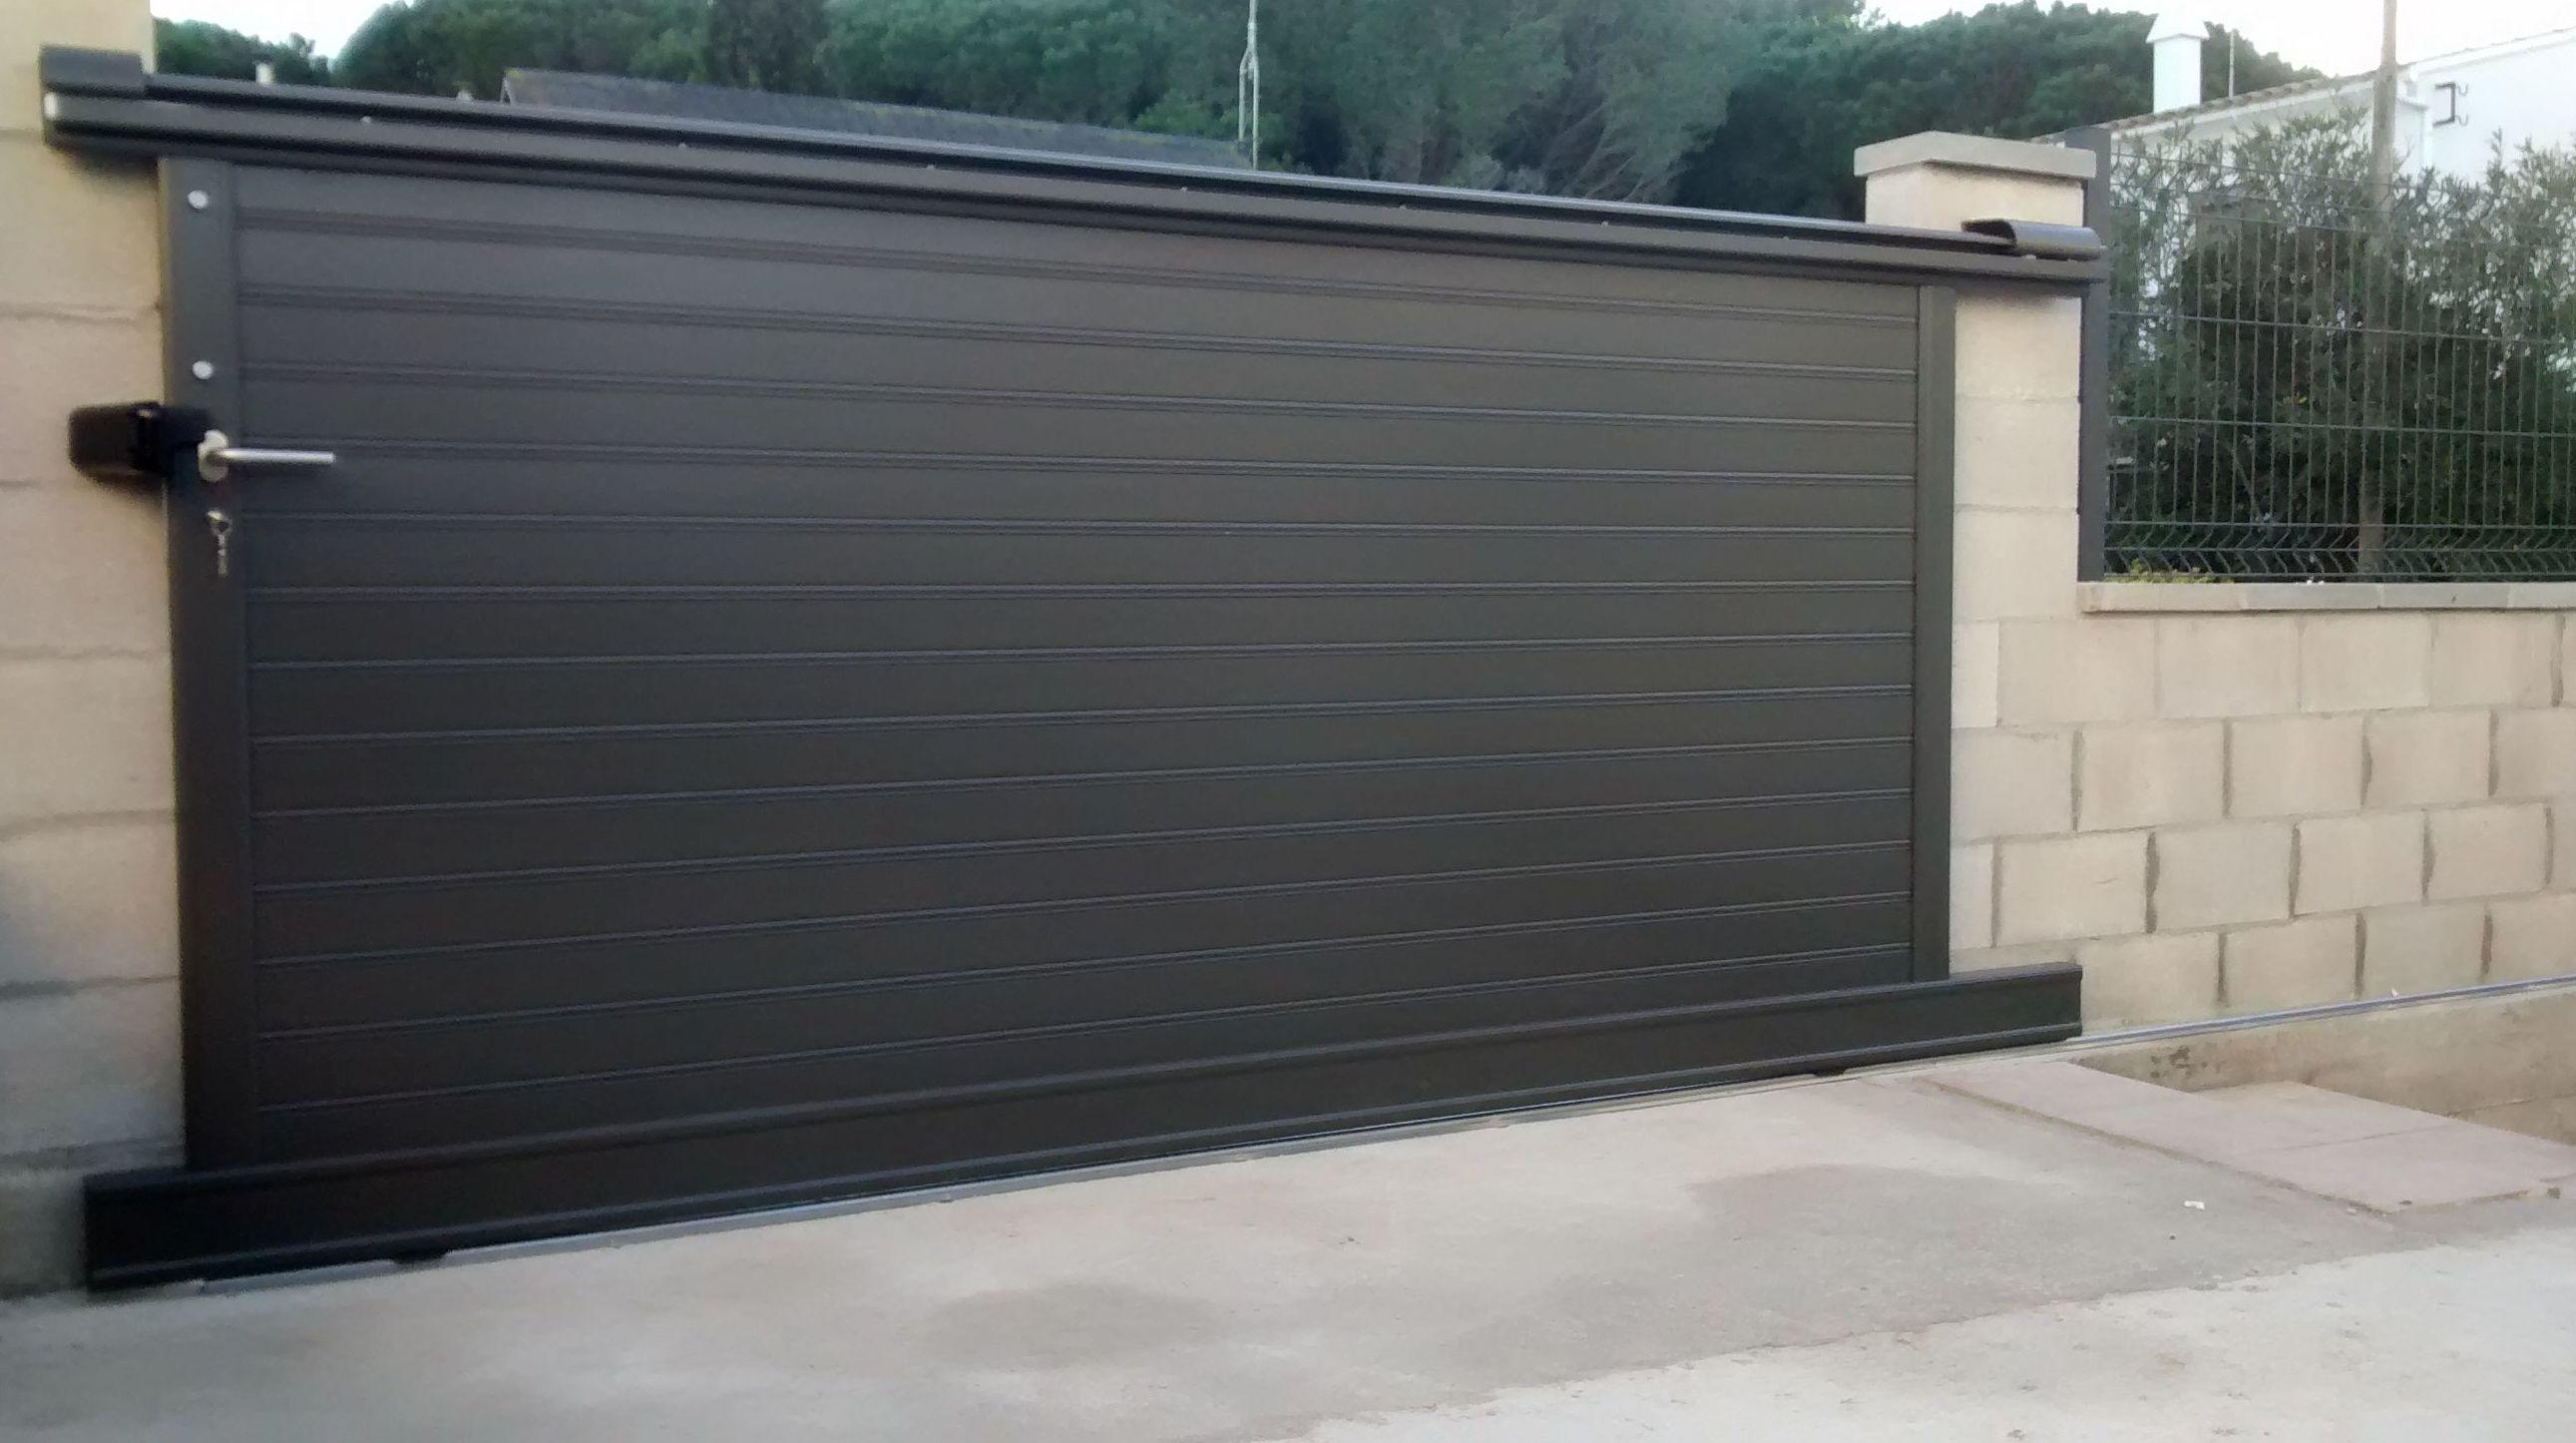 Puertas metalicas jardin elegant puerta metalica mod for Puertas de jardin de aluminio